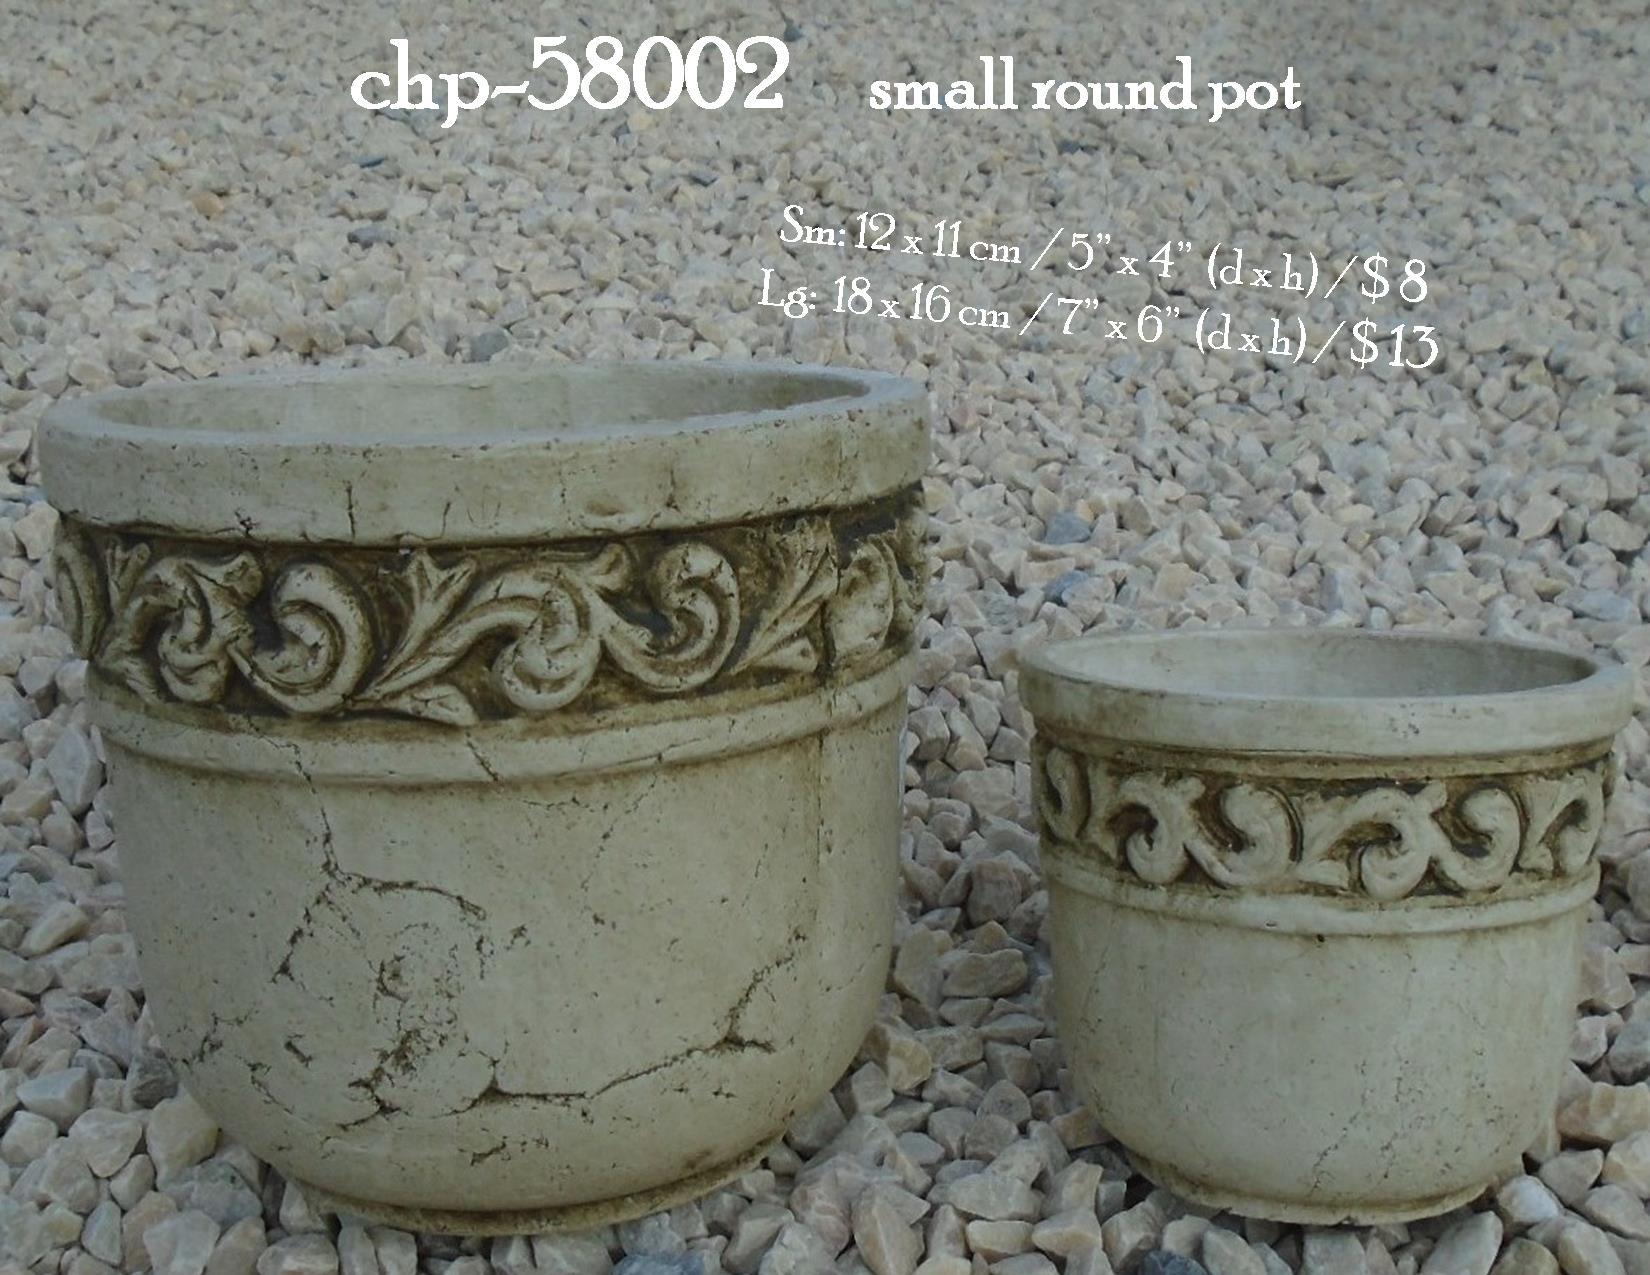 chp-58002     small round pot